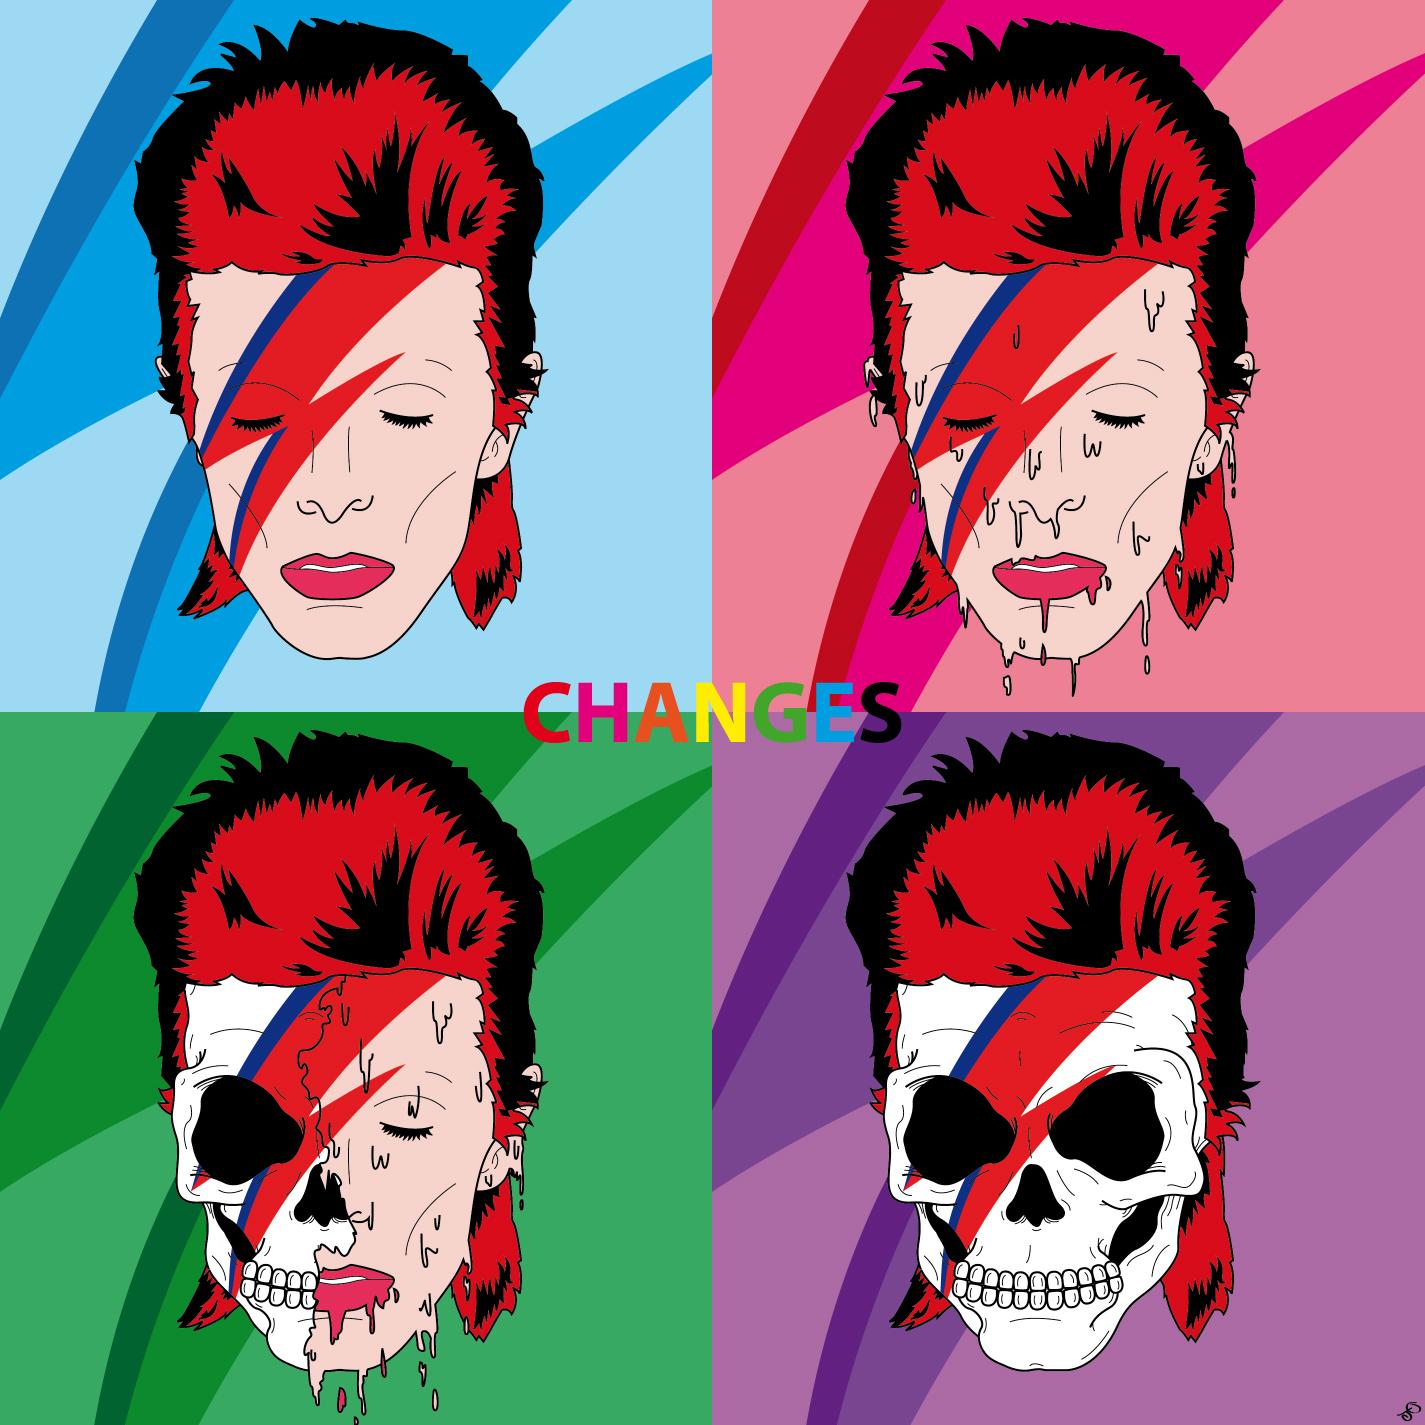 Bowie-Album-Cover-Final-Major-Project-For-University